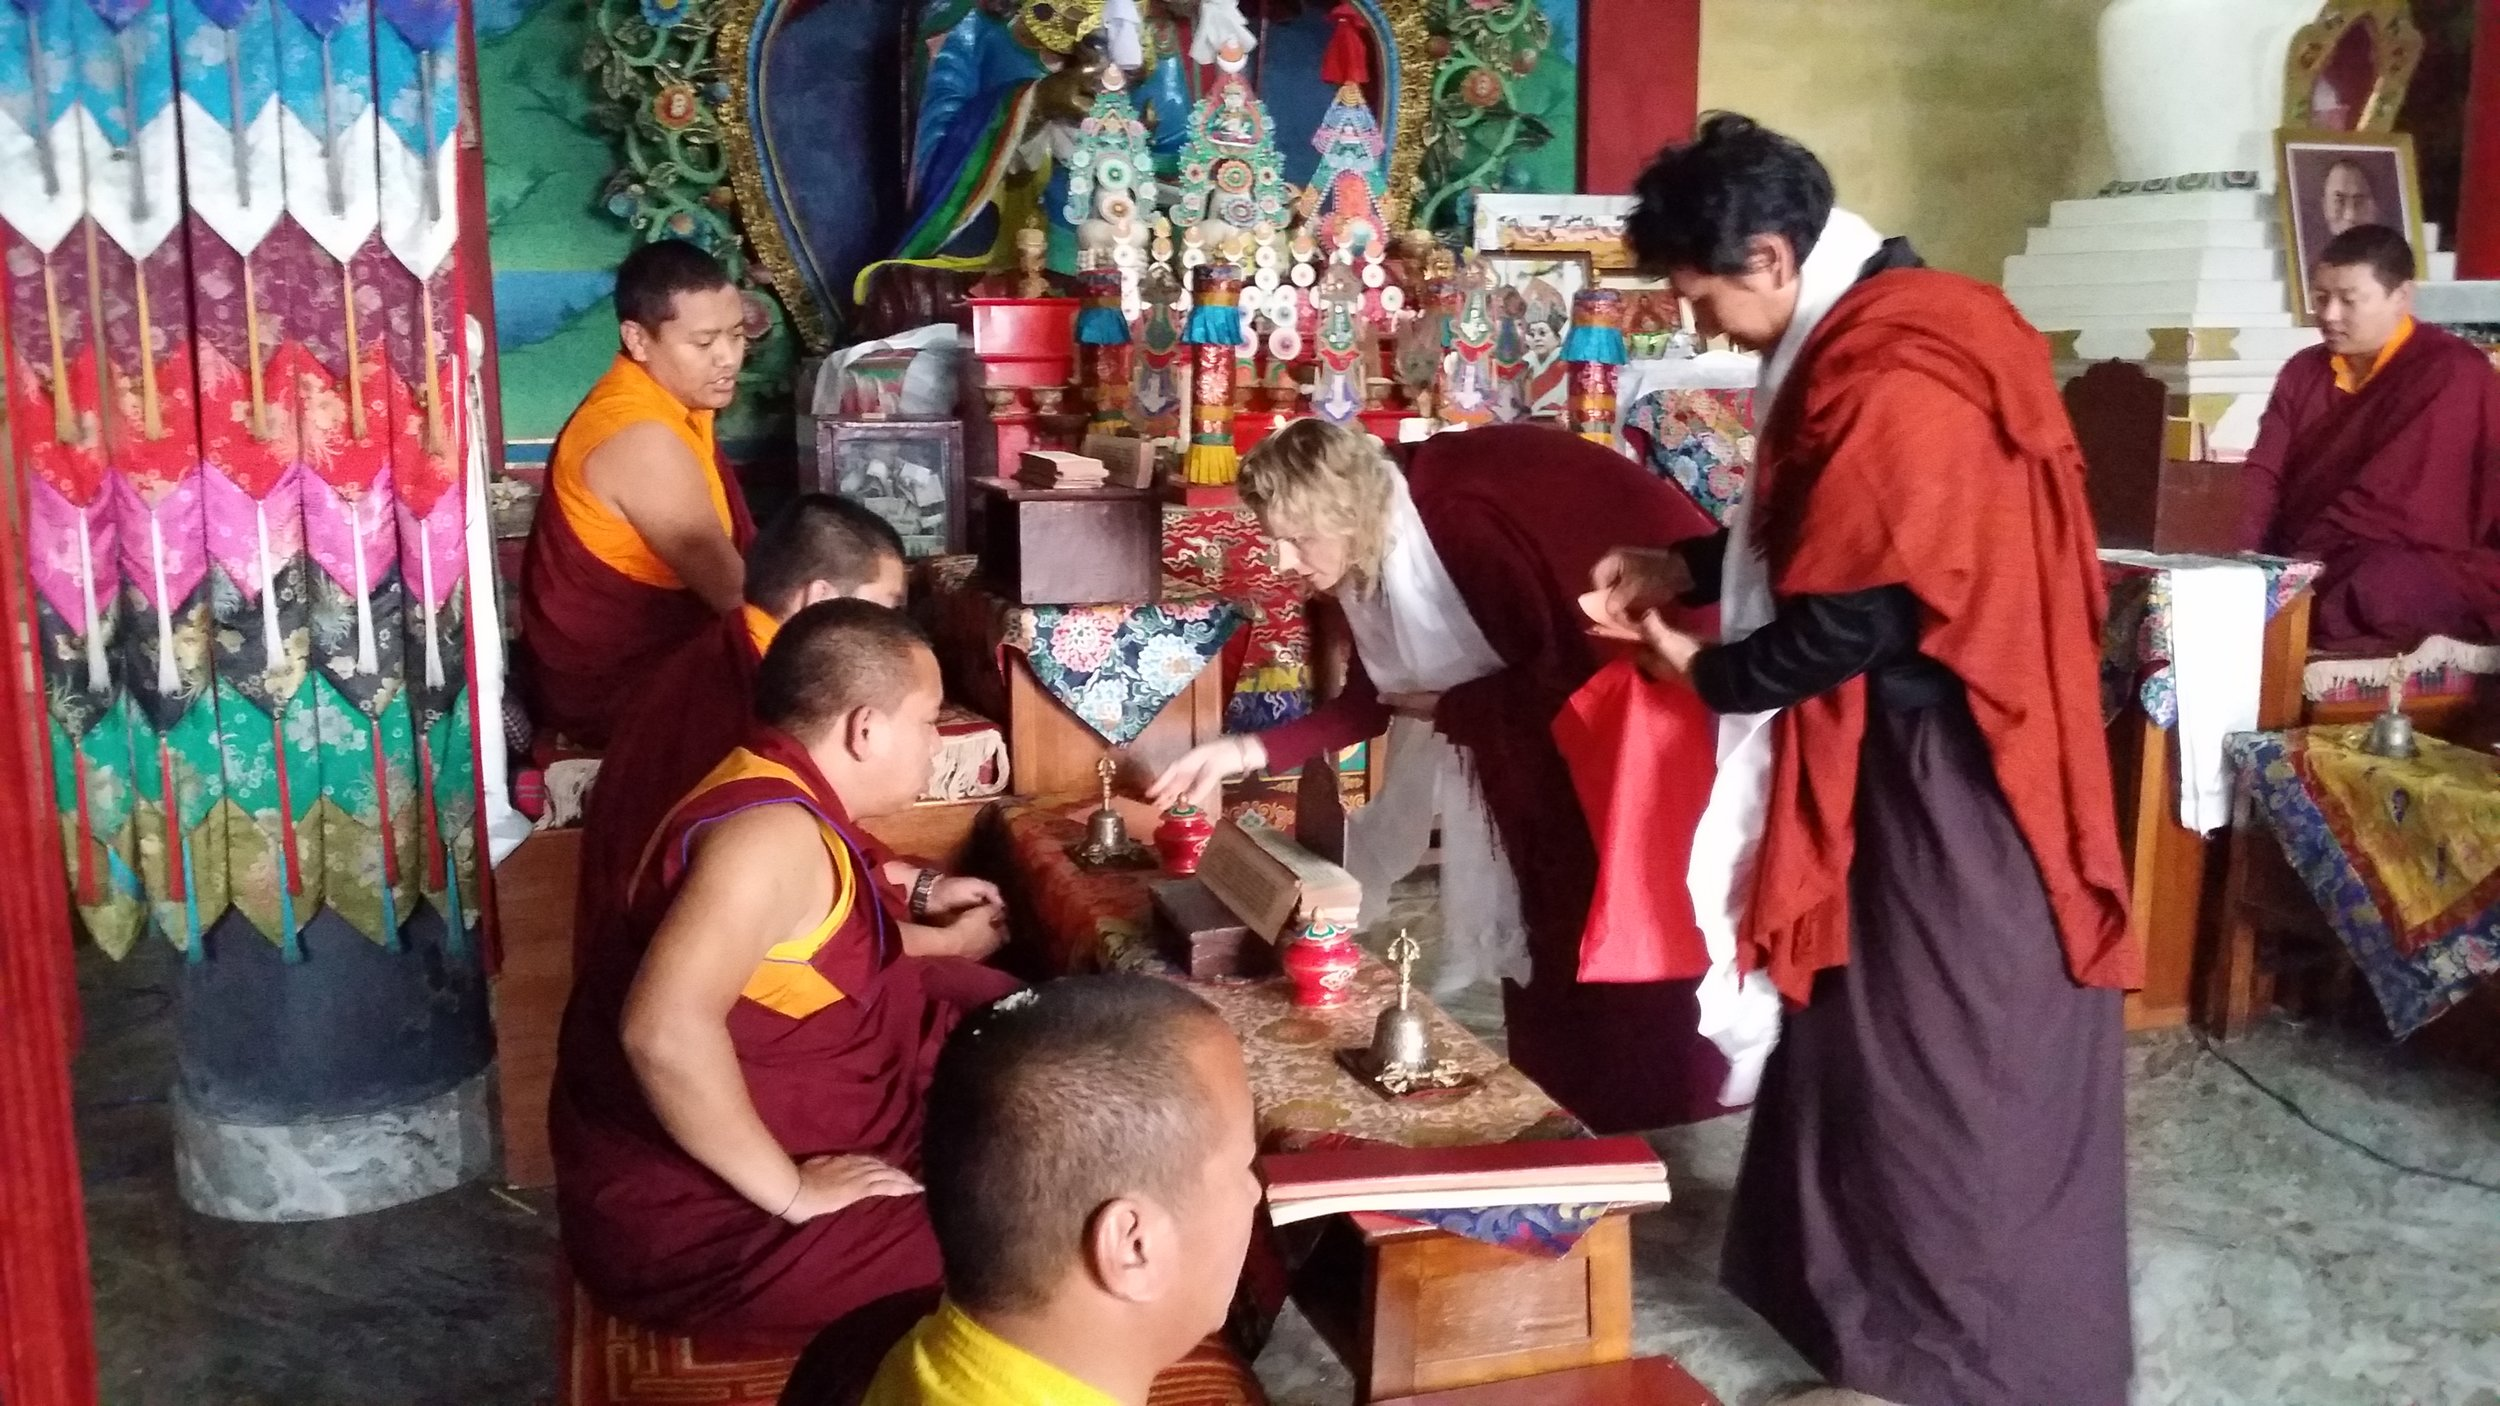 Making offerings to Zangdok Palri Monastery, Kalimpong, India